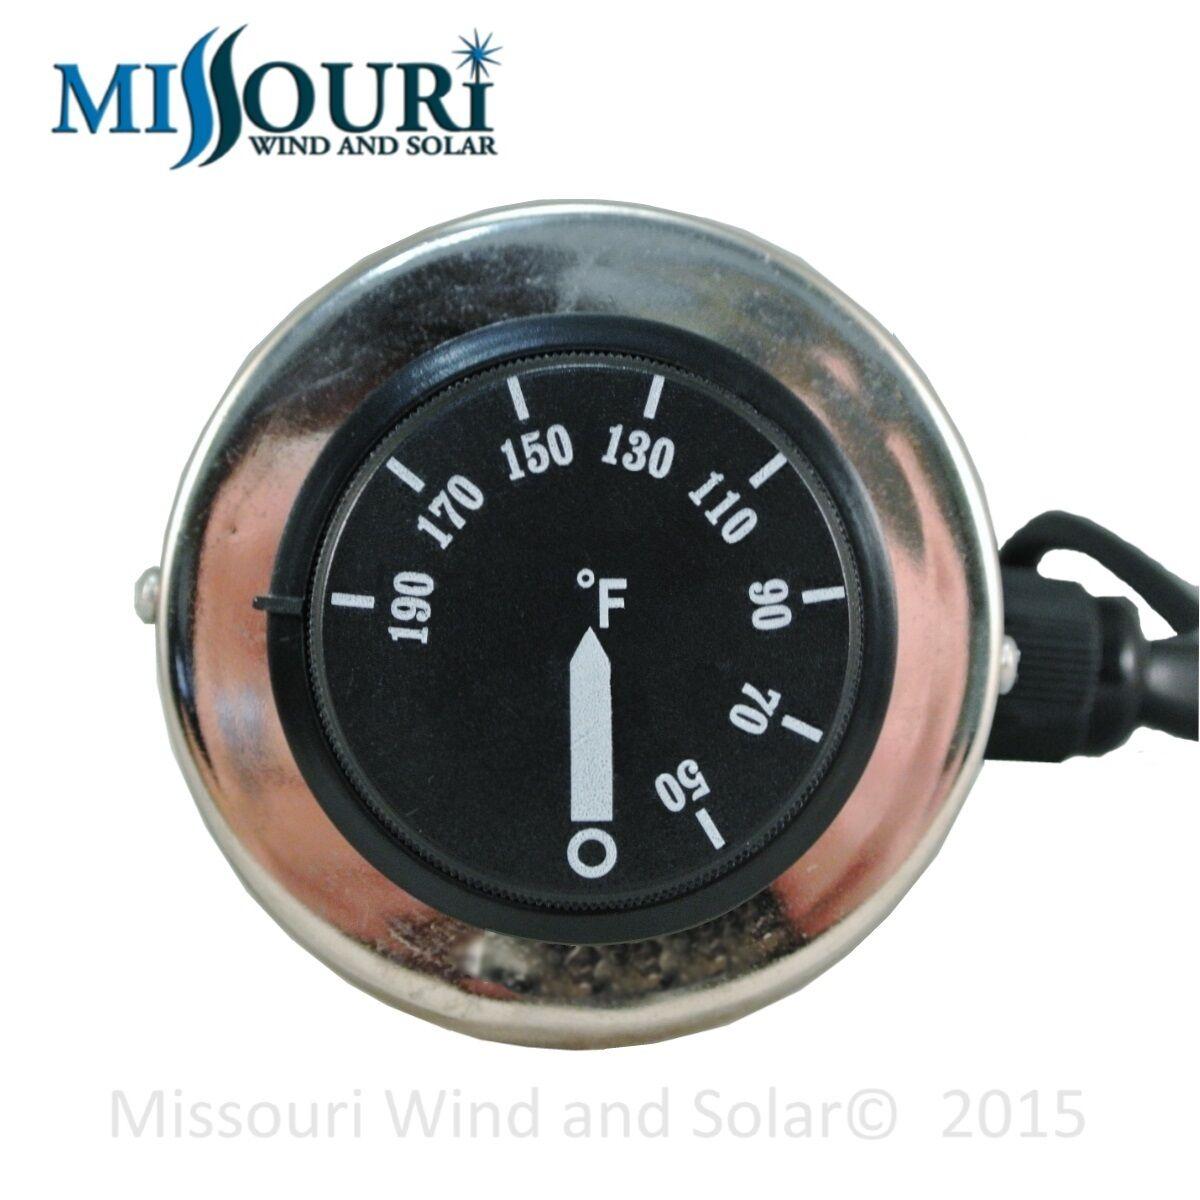 Low Voltage Heating Wire : Volt watt dc low voltage submersible water heating